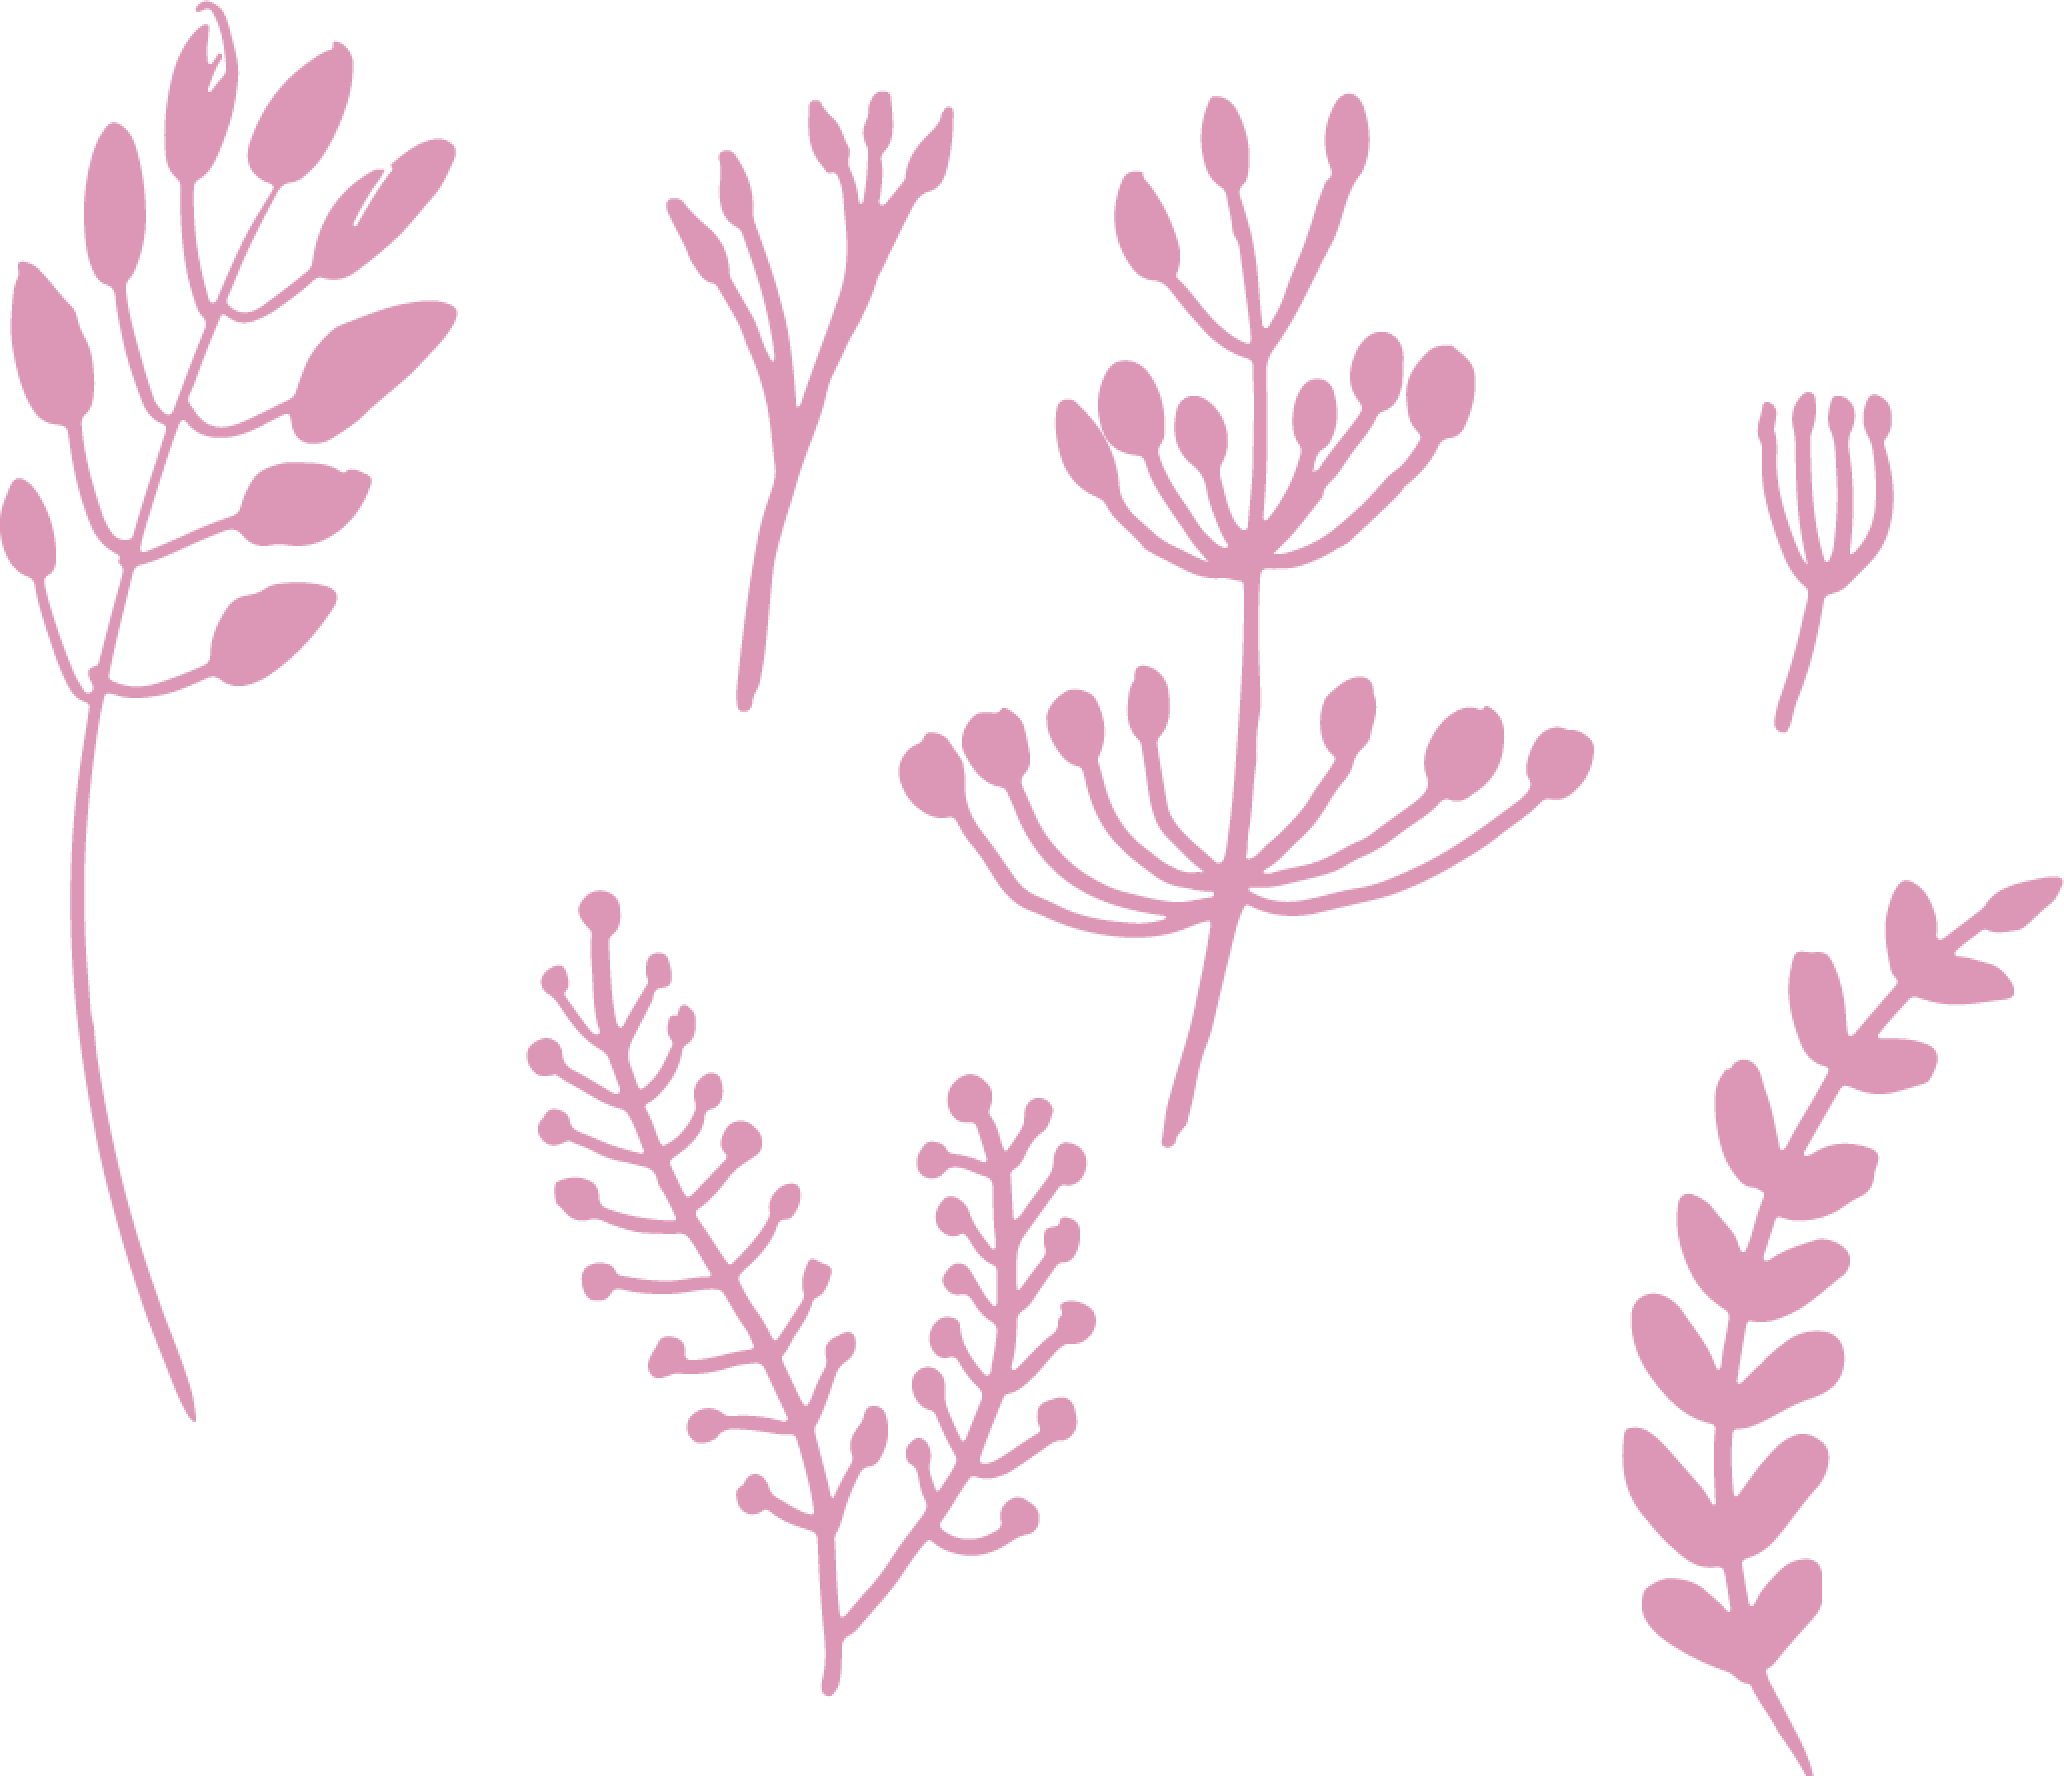 plants@2x